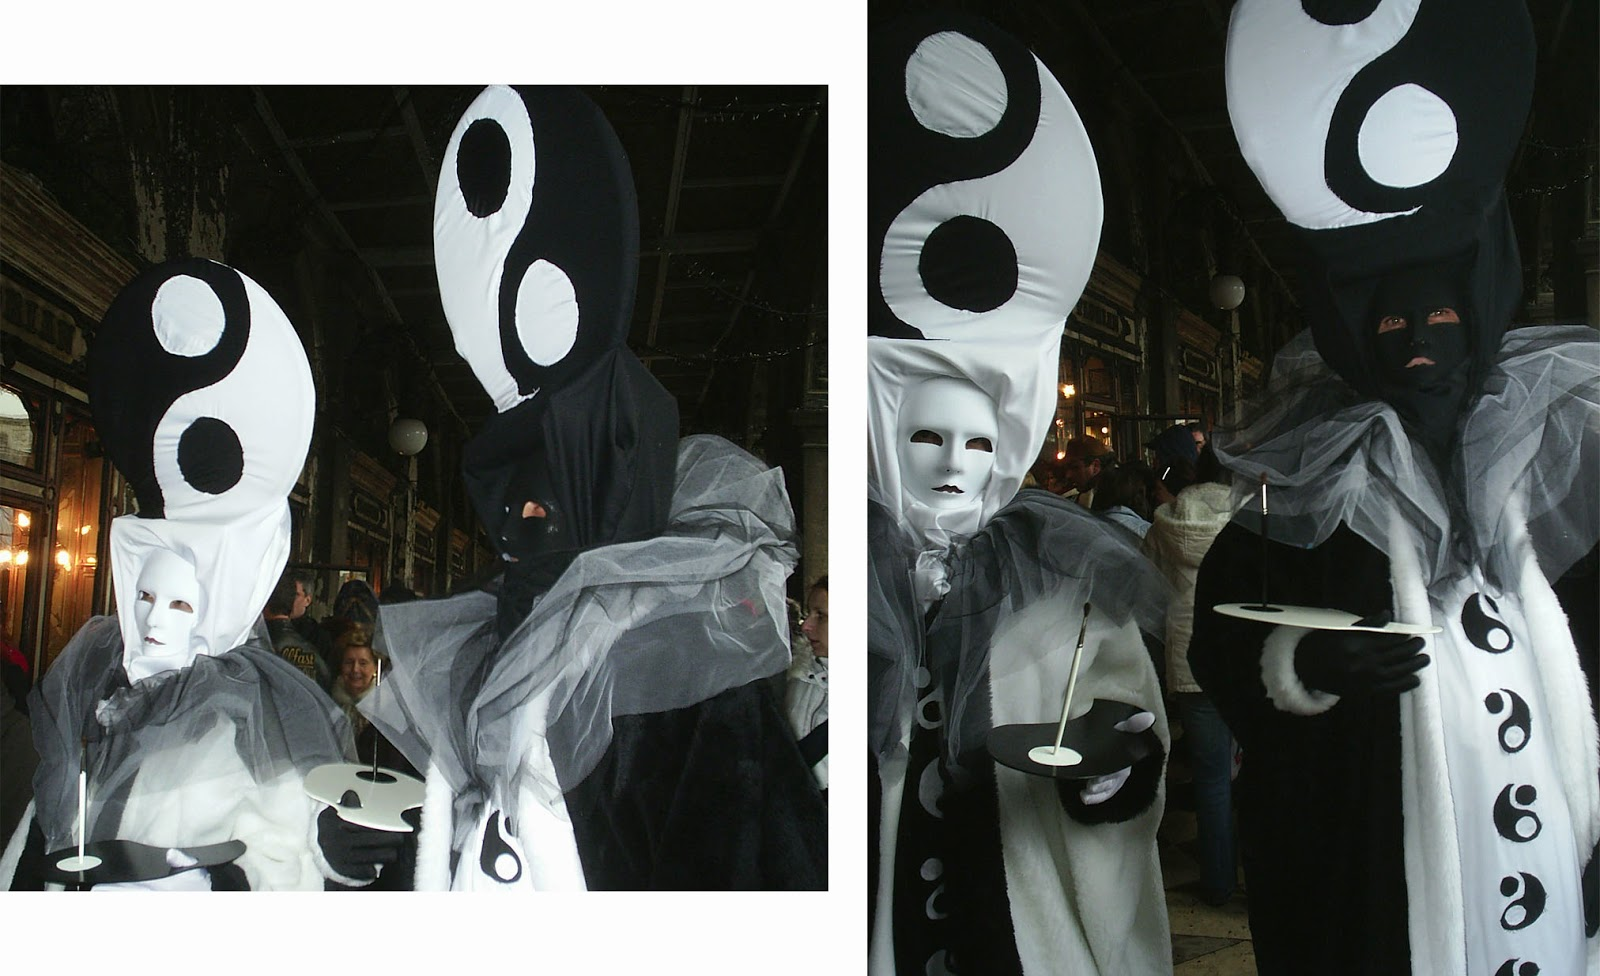 Yin Yang, Carnaval, Venecia, Italia